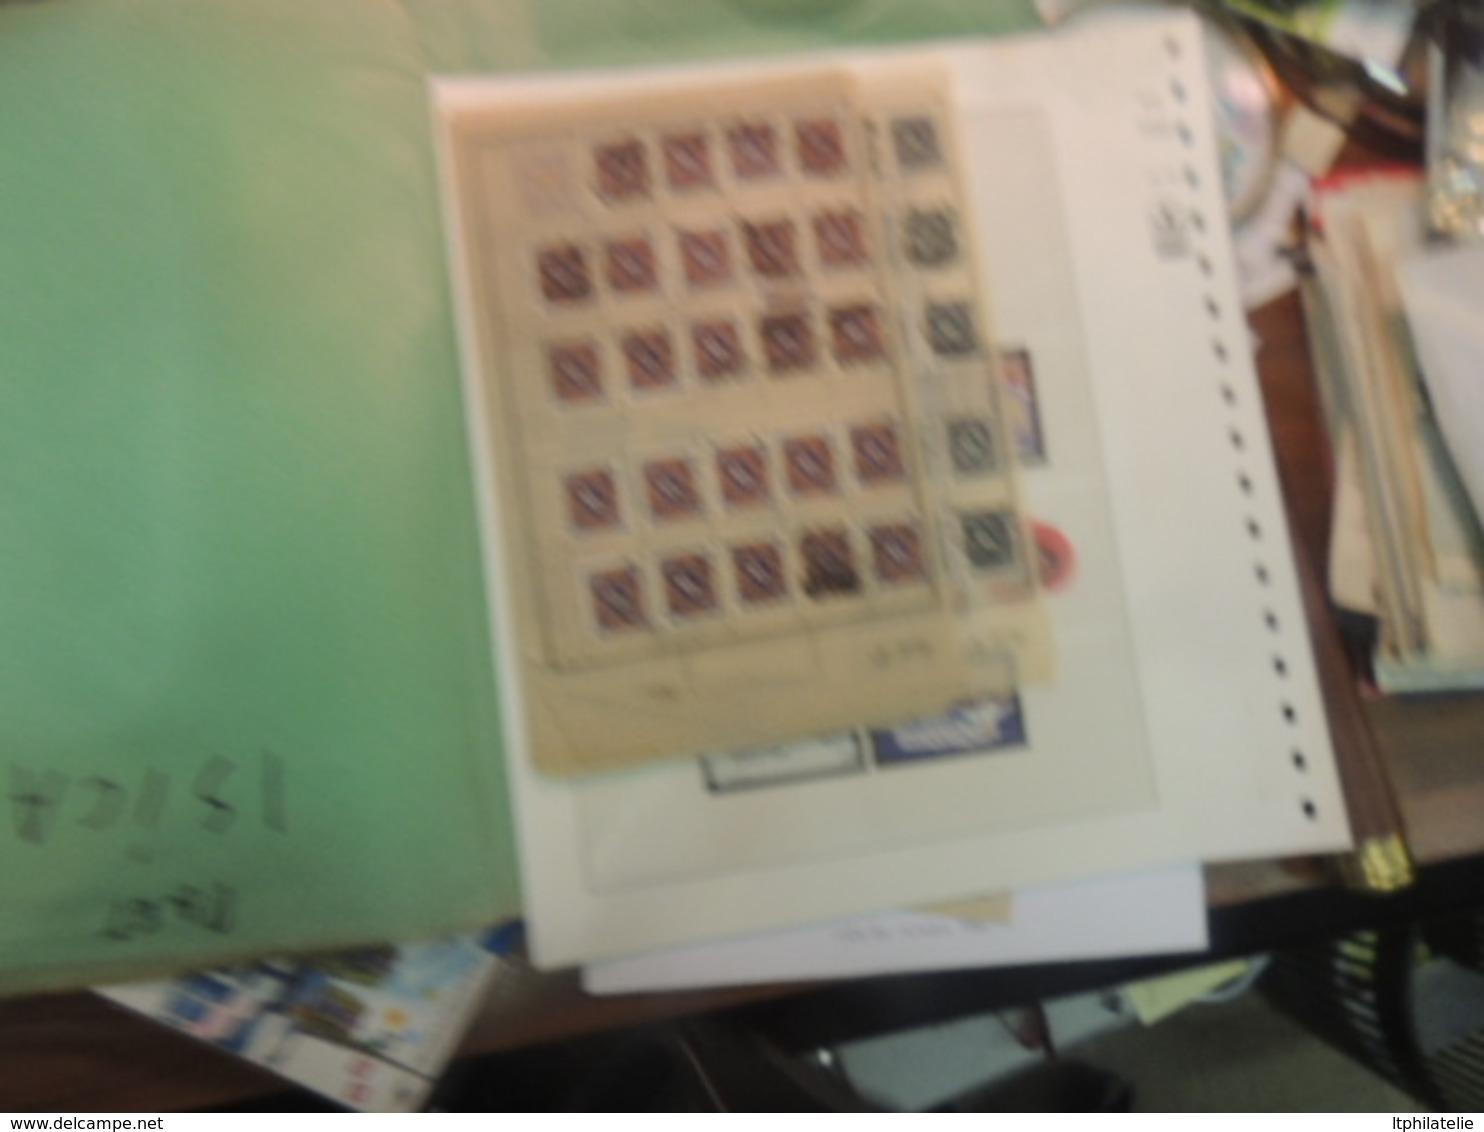 AFFAIRE  GROS CARTON DIRECT DU COLLECTIONNEUR  A EXAMINER UN PEU DE TOUT  TIMBRES CARTES  DIVERS VOIR PHOTOS - Timbres